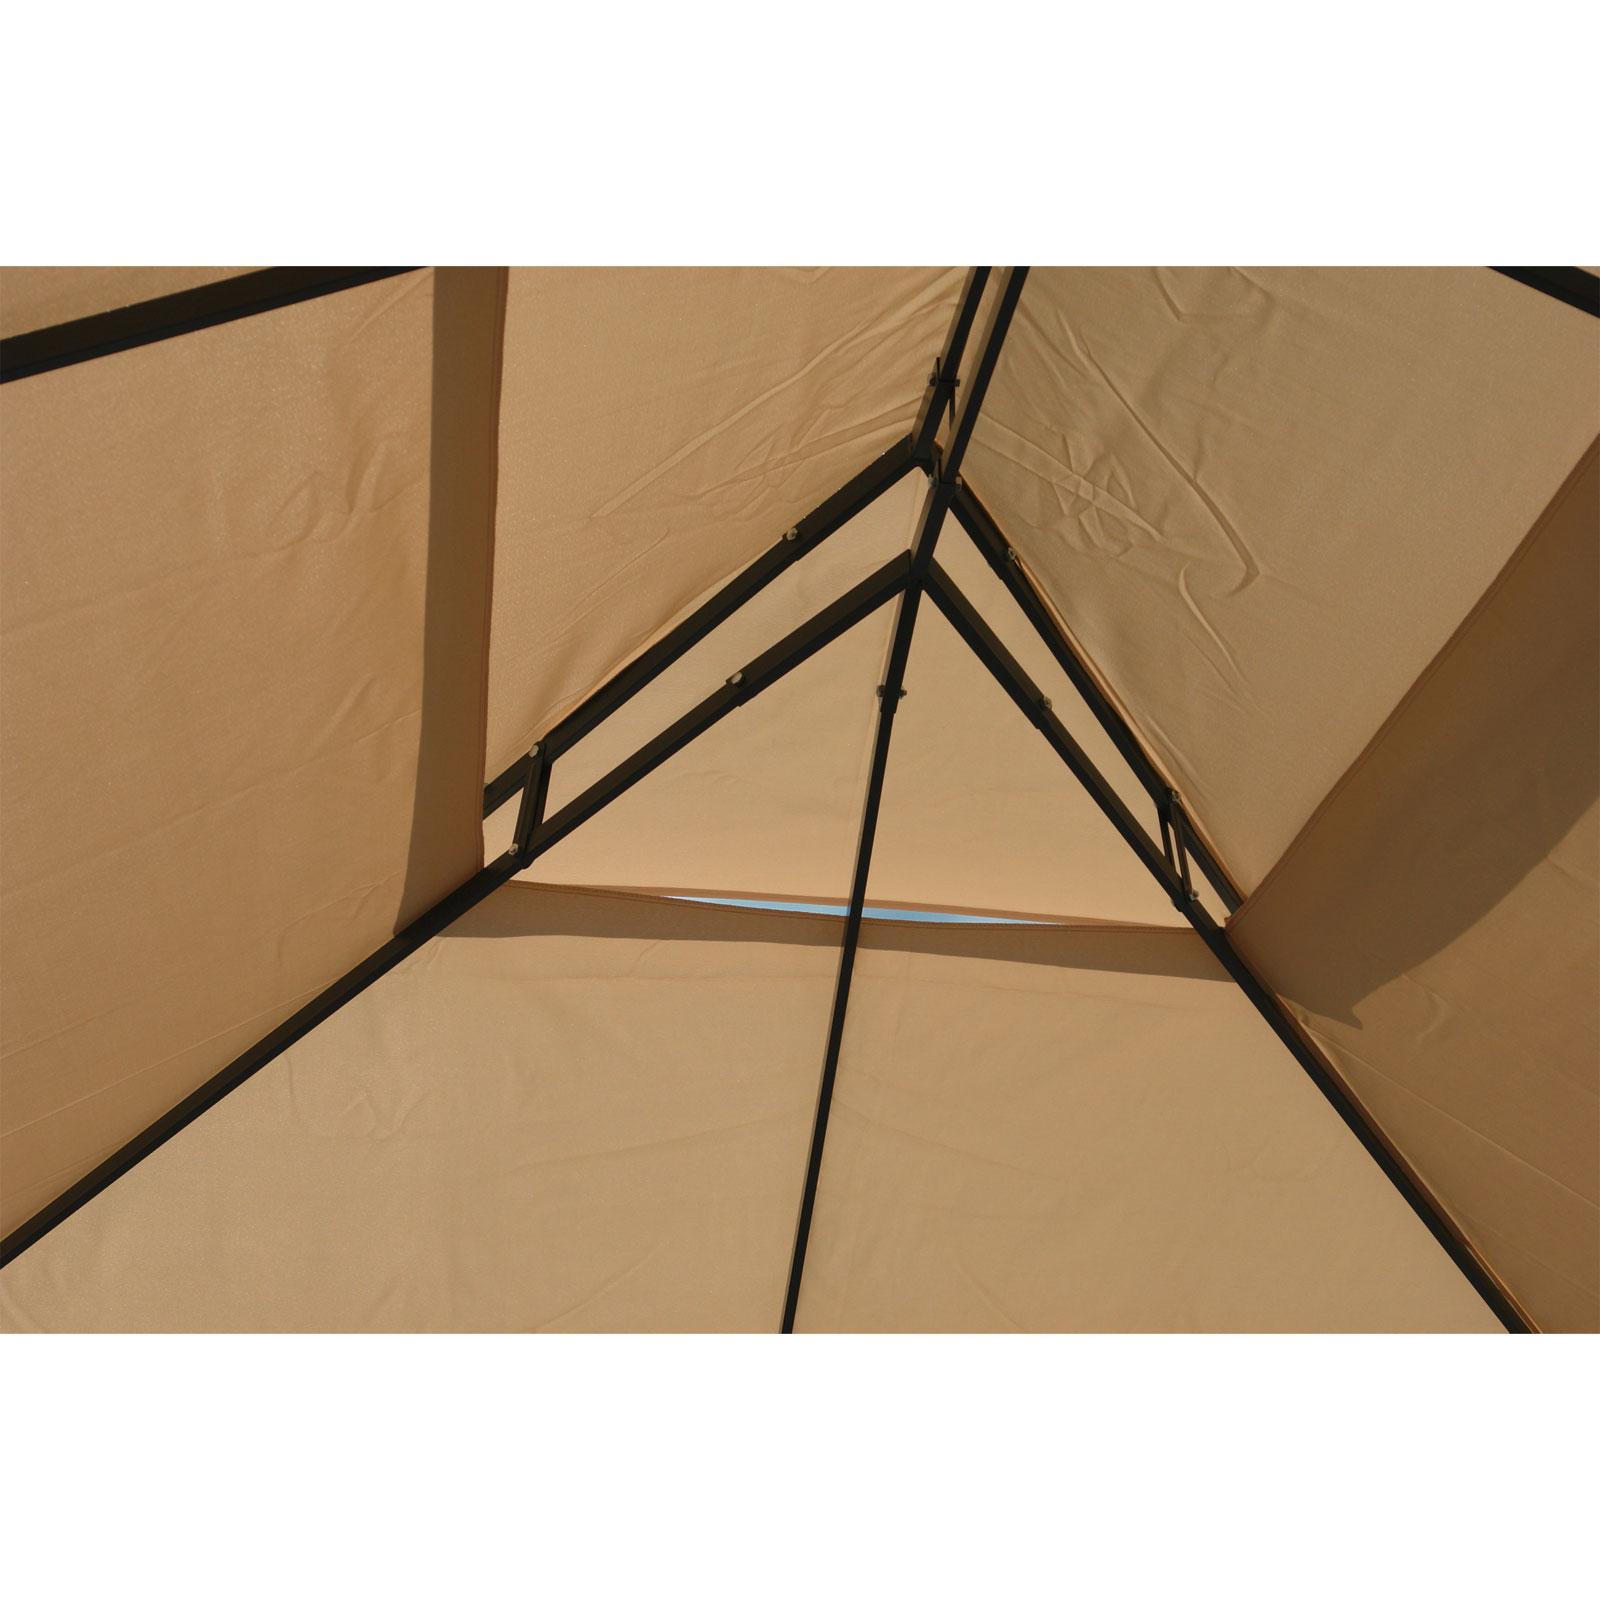 917491 metall pavillion gartenpavillon gartenzelt partyzelt garten pavillon 3x4 ebay. Black Bedroom Furniture Sets. Home Design Ideas